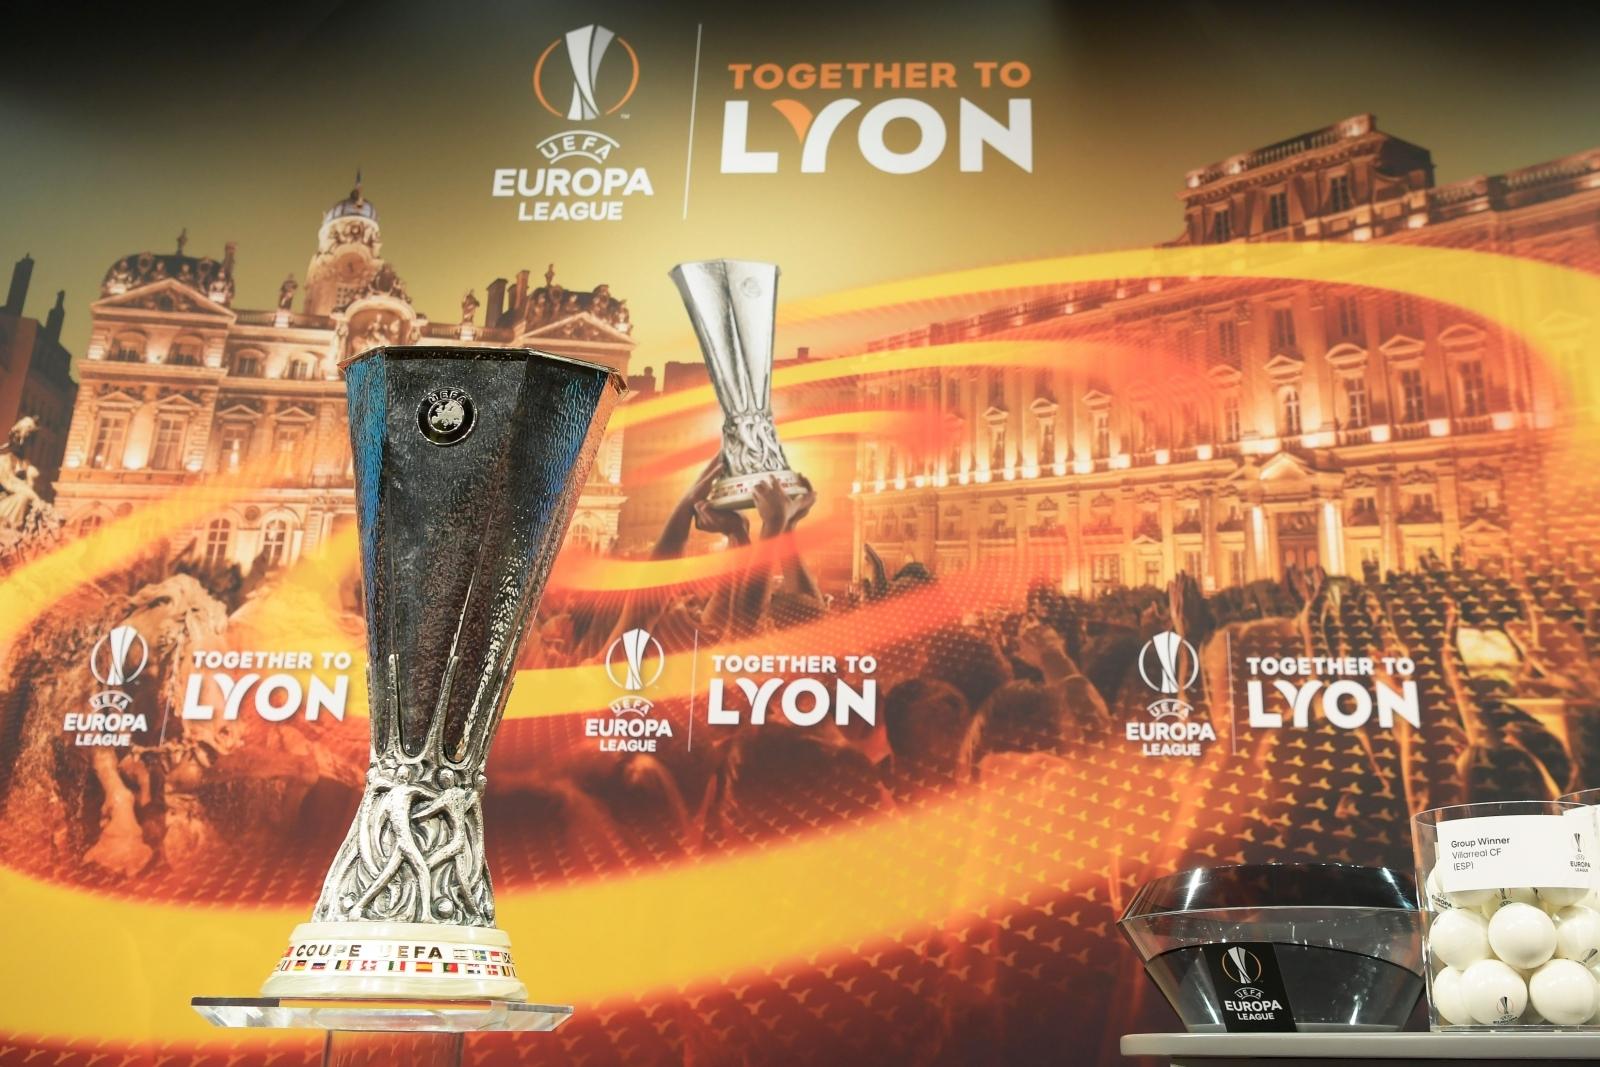 europa league live free tv